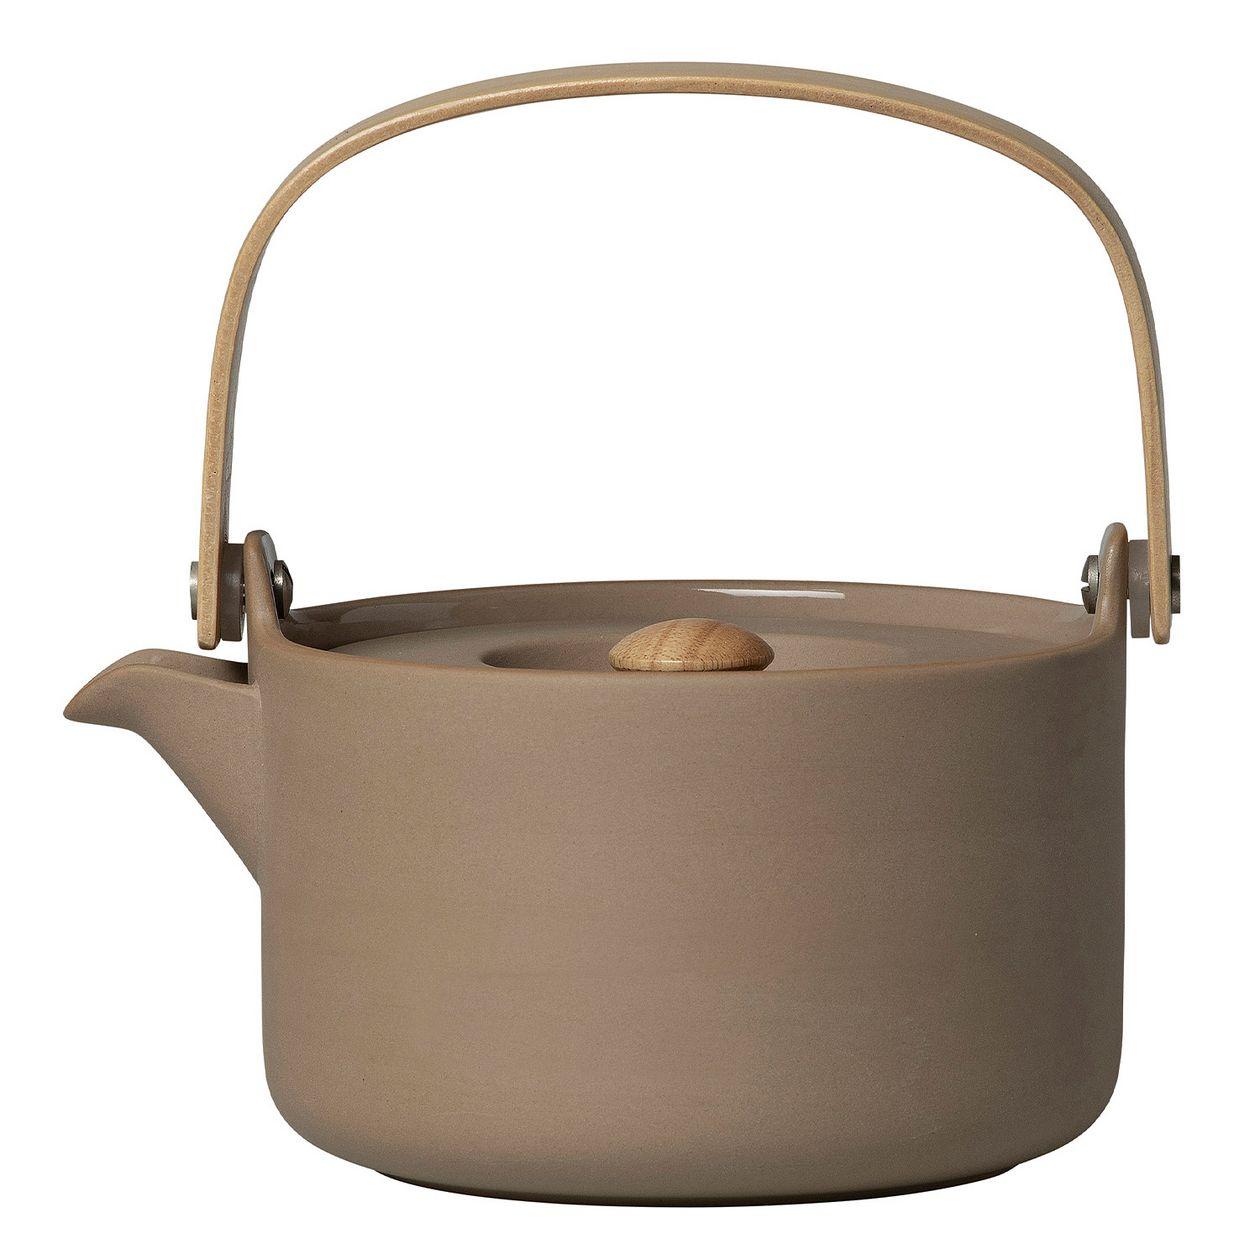 Marimekko Oiva teekannu 0,7 L, terra